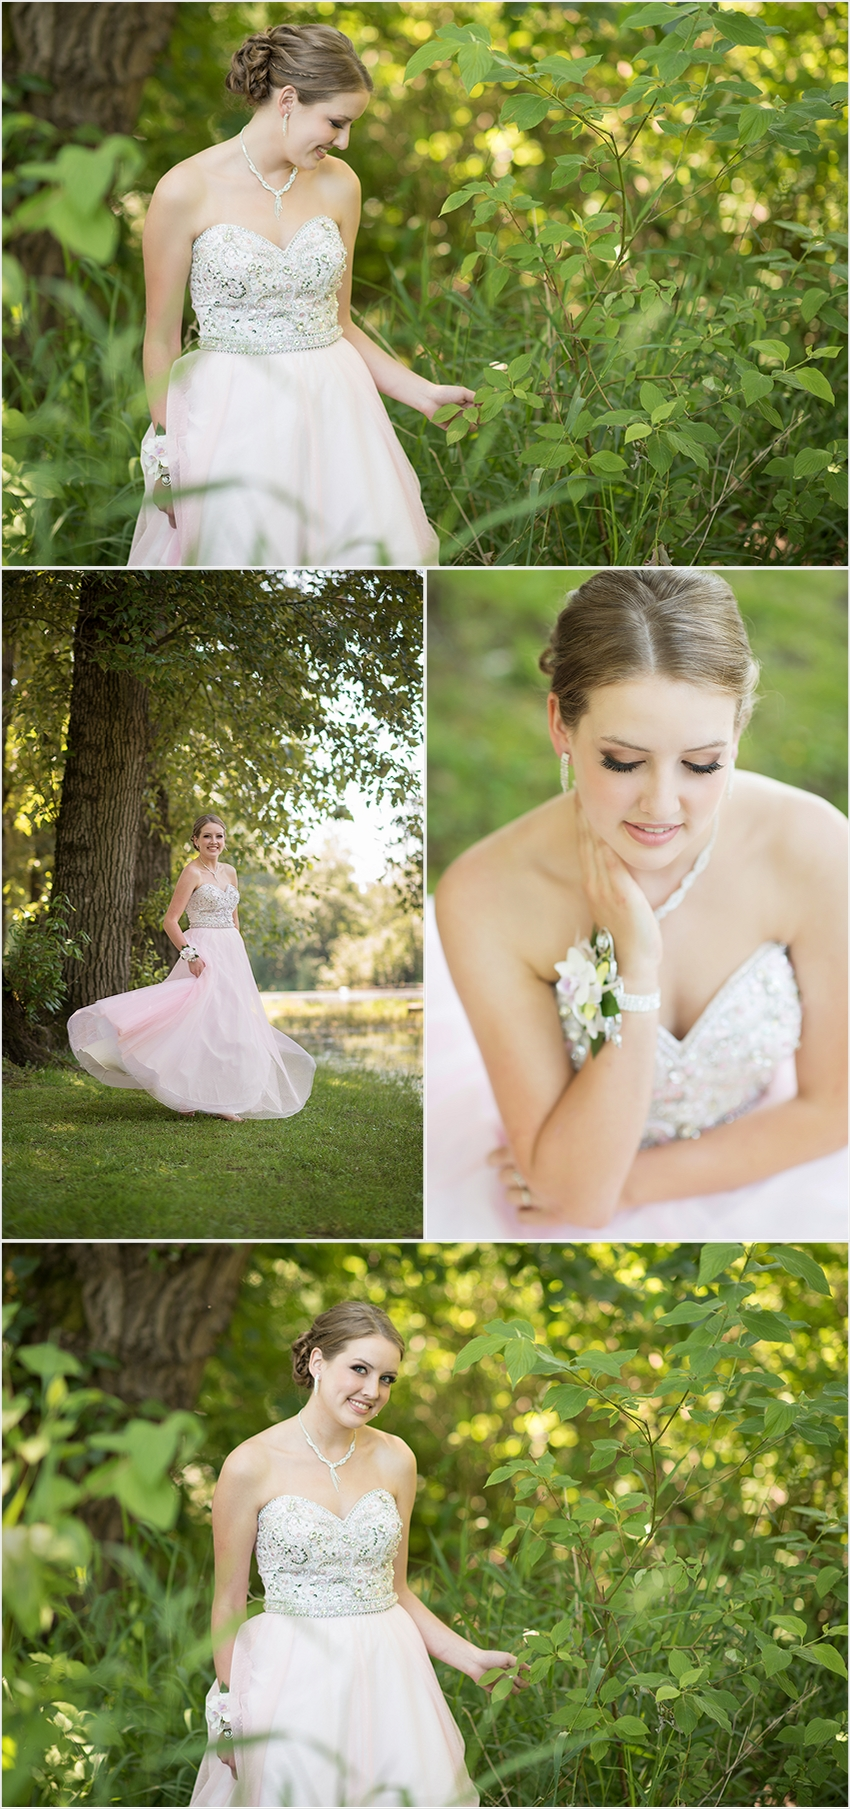 Abbotsford Grad Photographer Prom 2016 002 (Side 2)